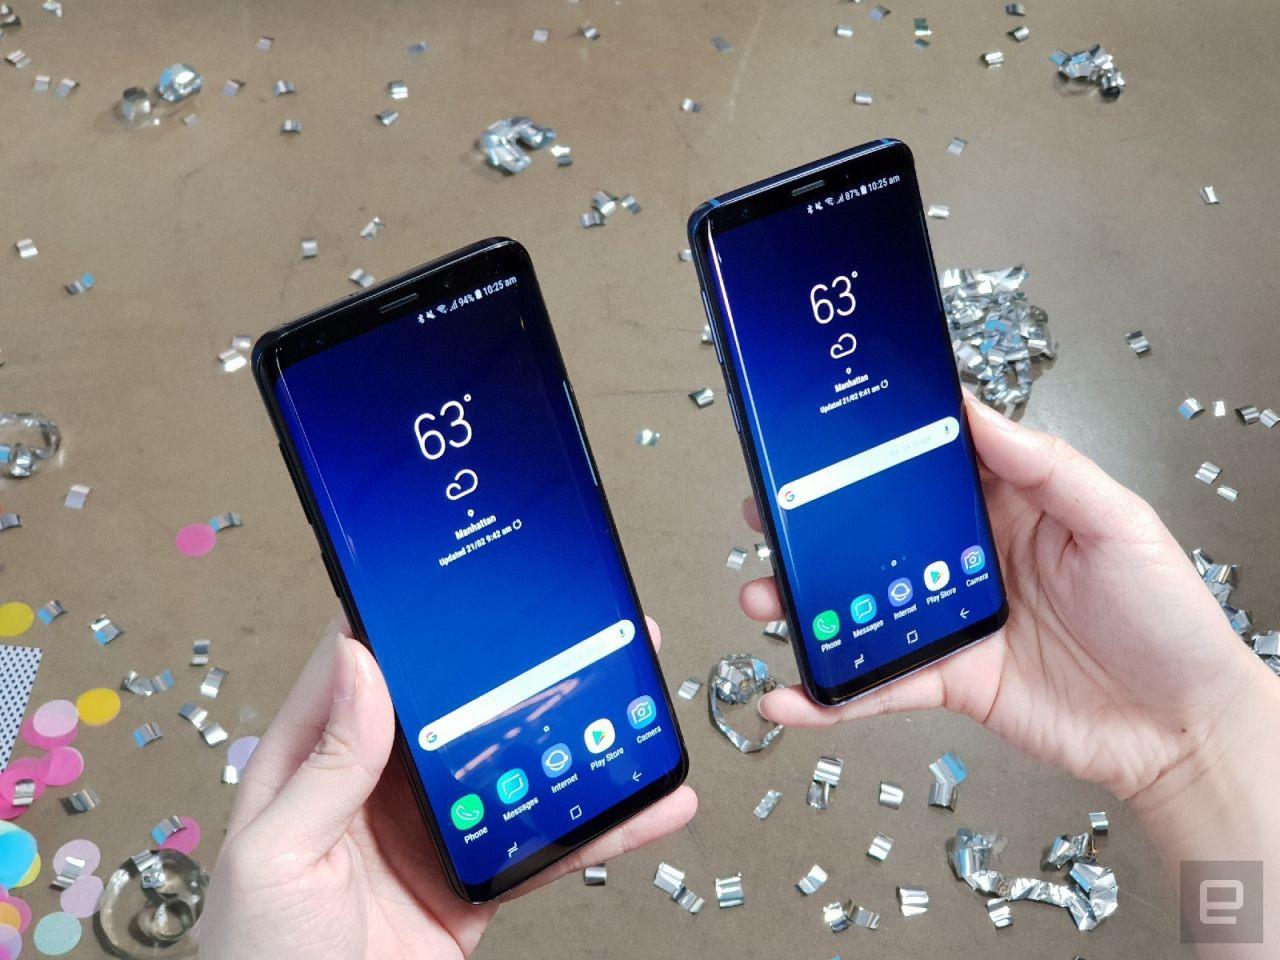 Samsung Galaxy S9 ve S9 + kamera örnekleri - Page 4